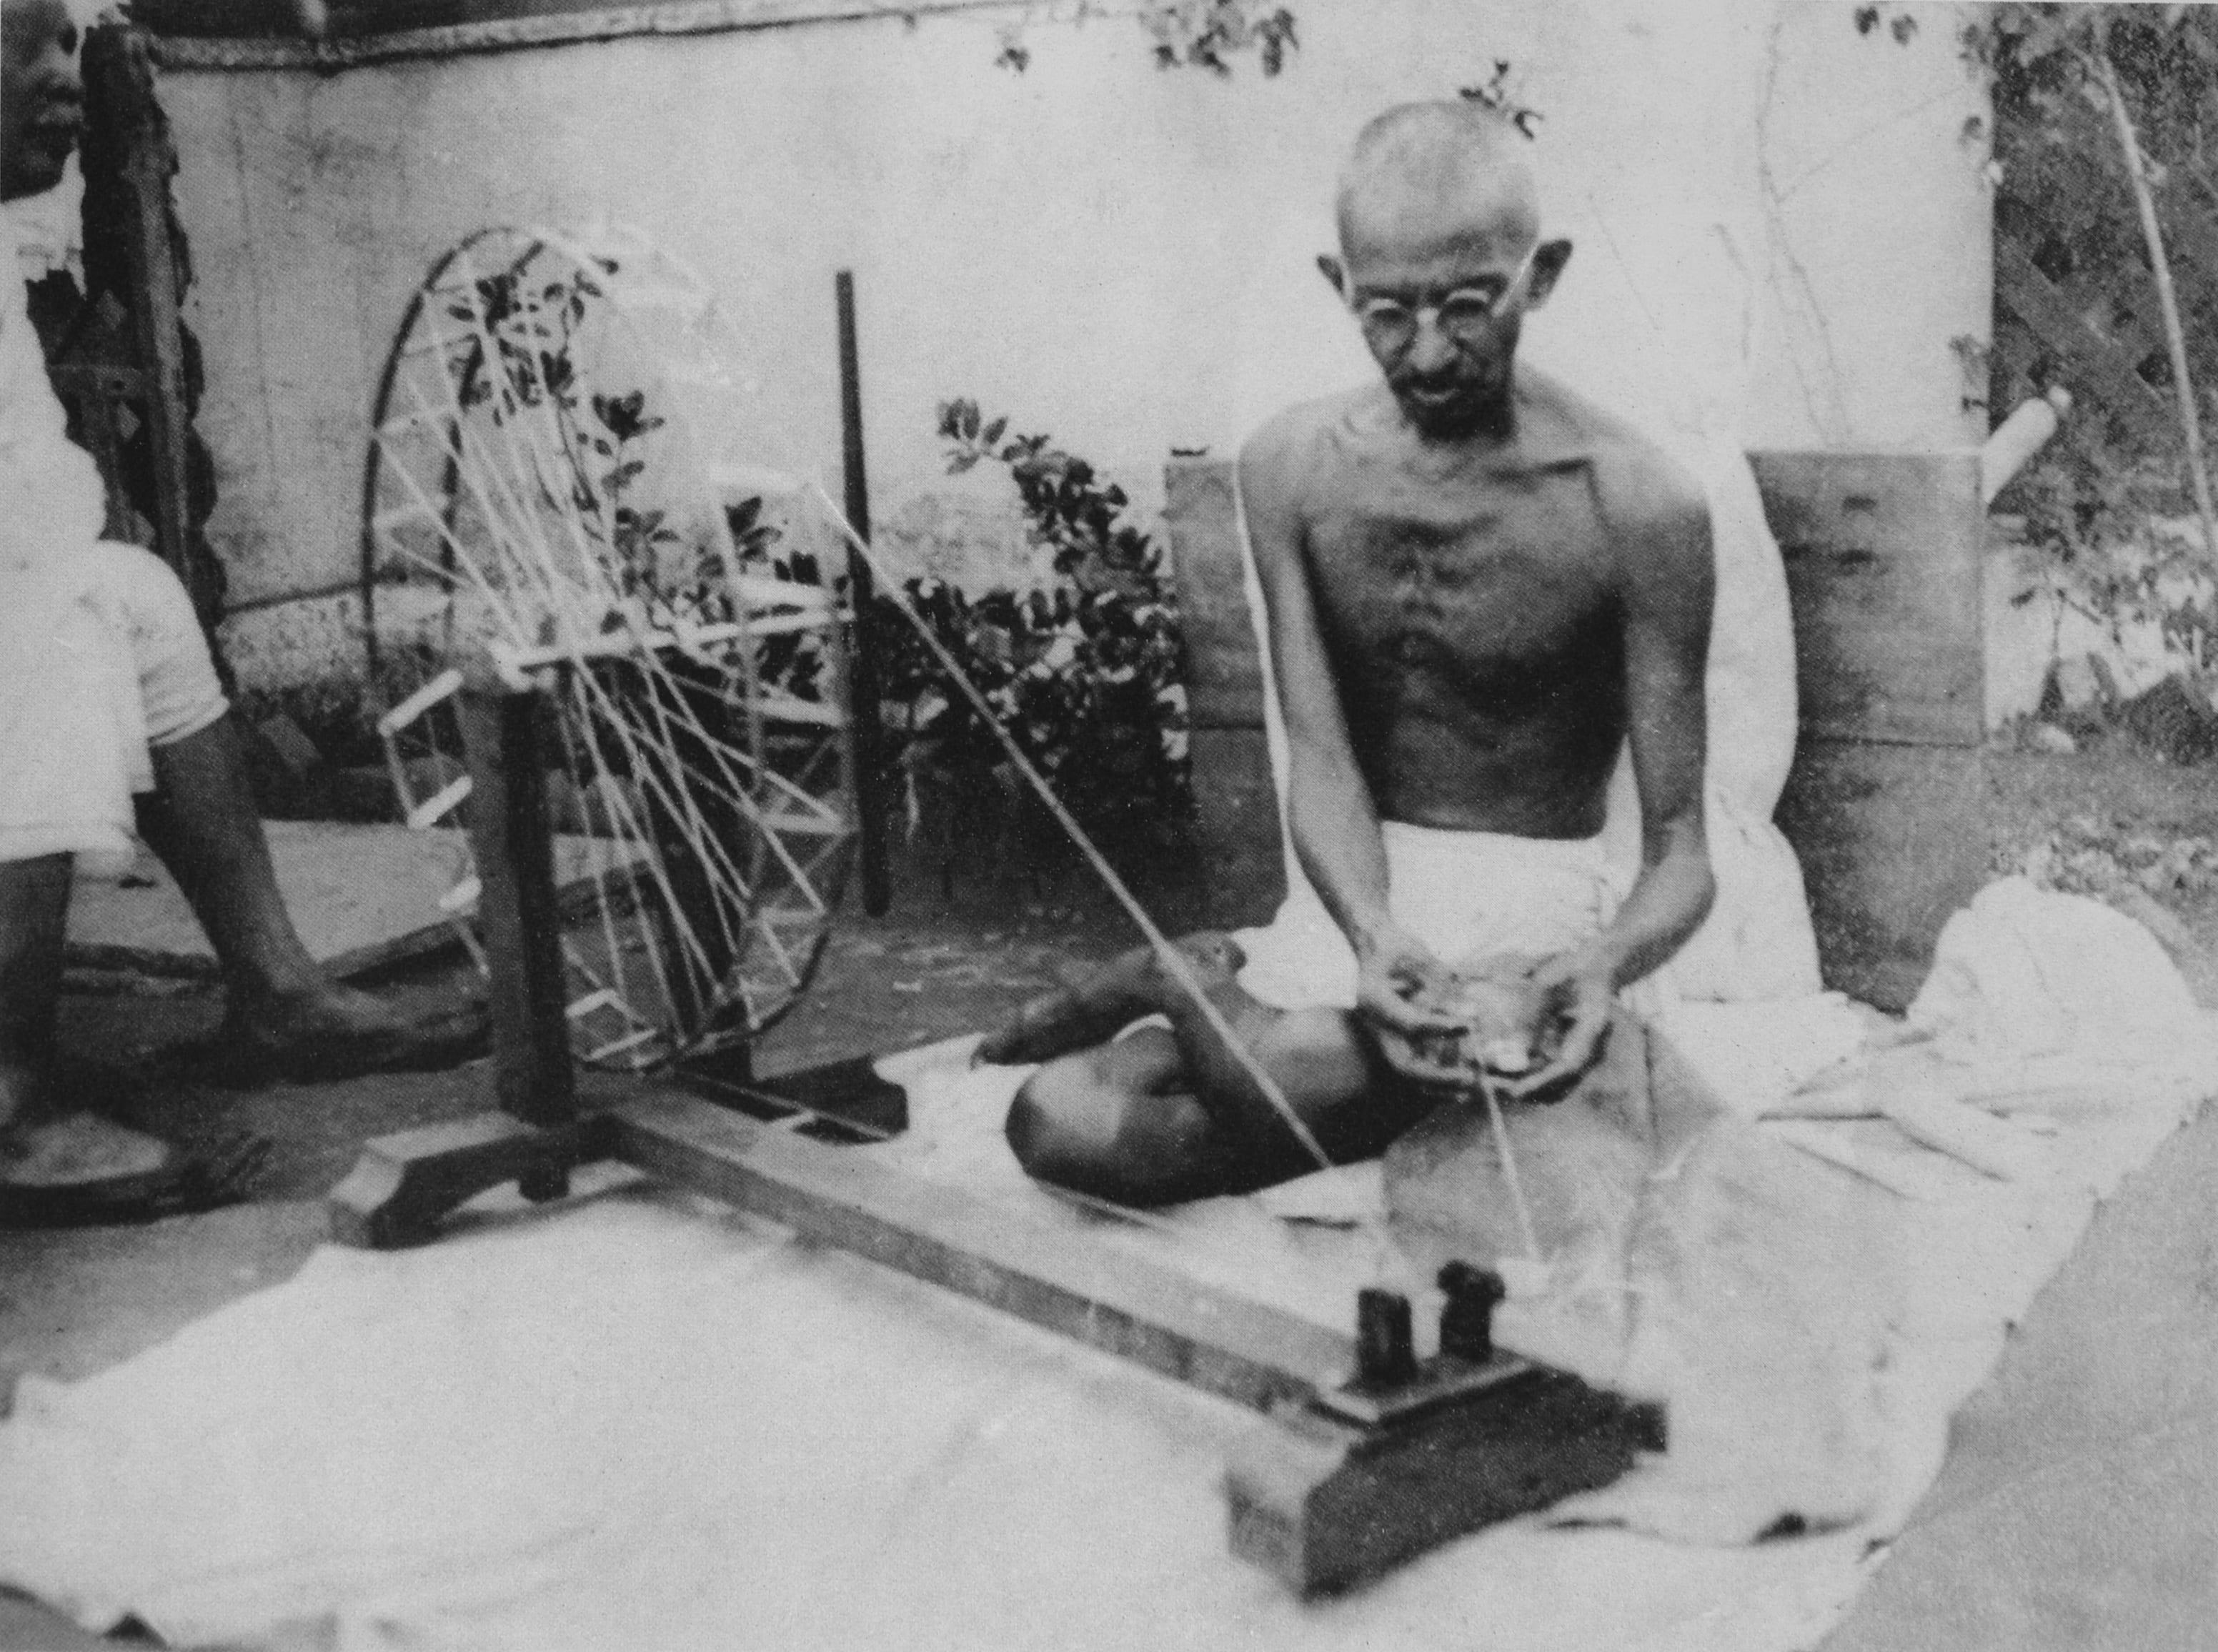 Mahatma Gandhi, Gandhi, 2 October, Gandhi Jayanti 2017, Gandhi jayanti, Gandhi birthday, second october, 2nd october, Gandhi history, Indian history, Indian national movement, Indian freedom struggle, Shahid Amin, Indian express